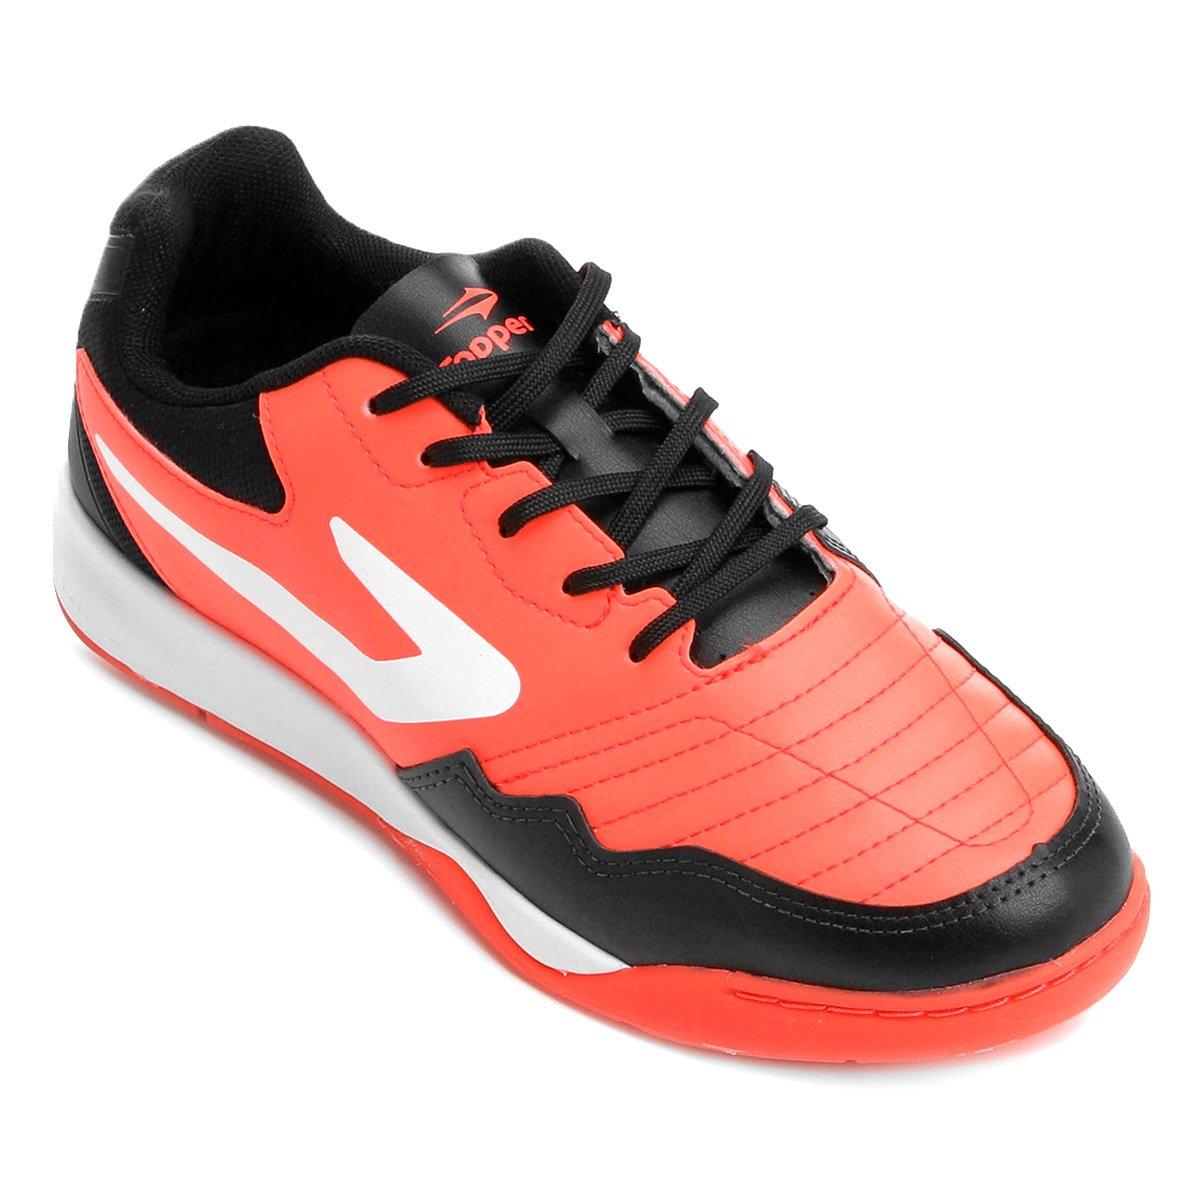 c56761a9b Chuteira Futsal Topper Dominator TD